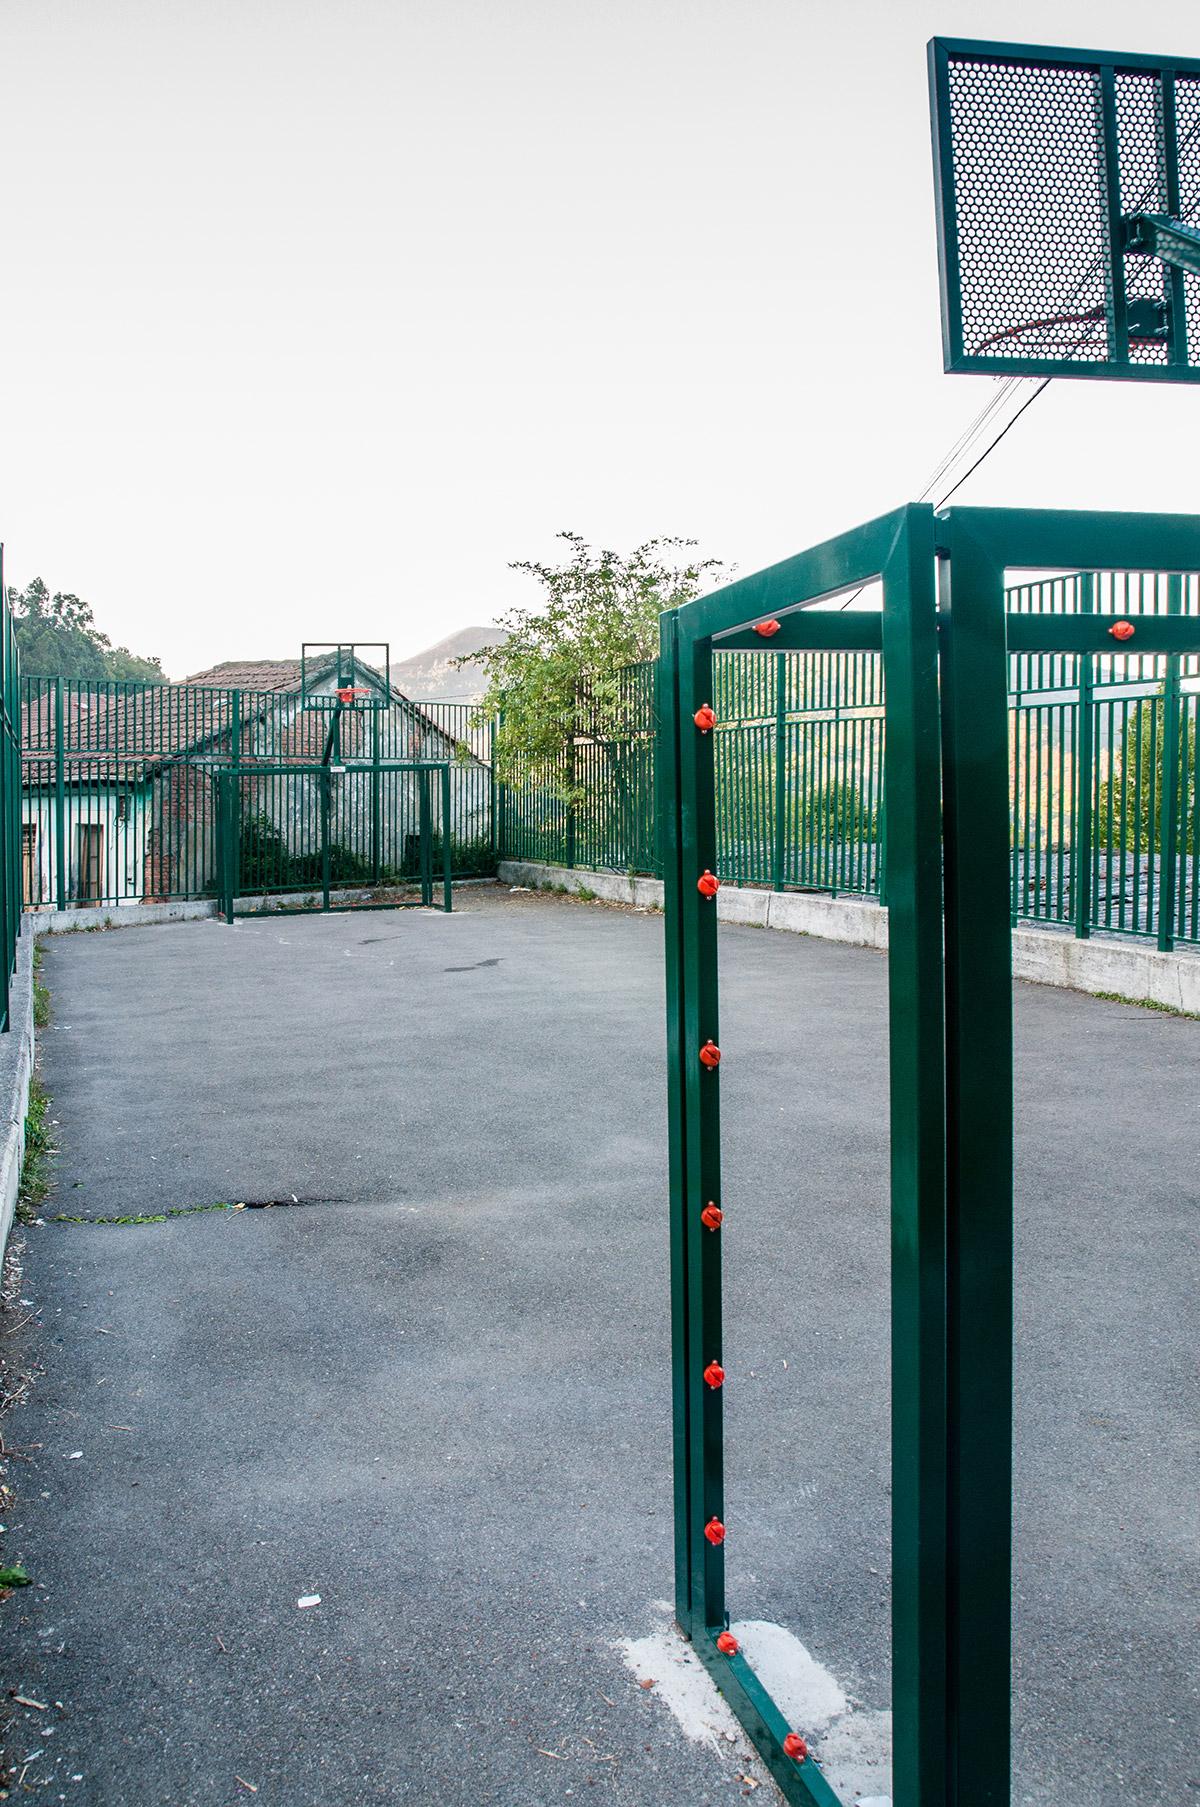 Siana | Cancha de fútbol y baloncesto | Autor: Jesús Blanco| AF Semeya